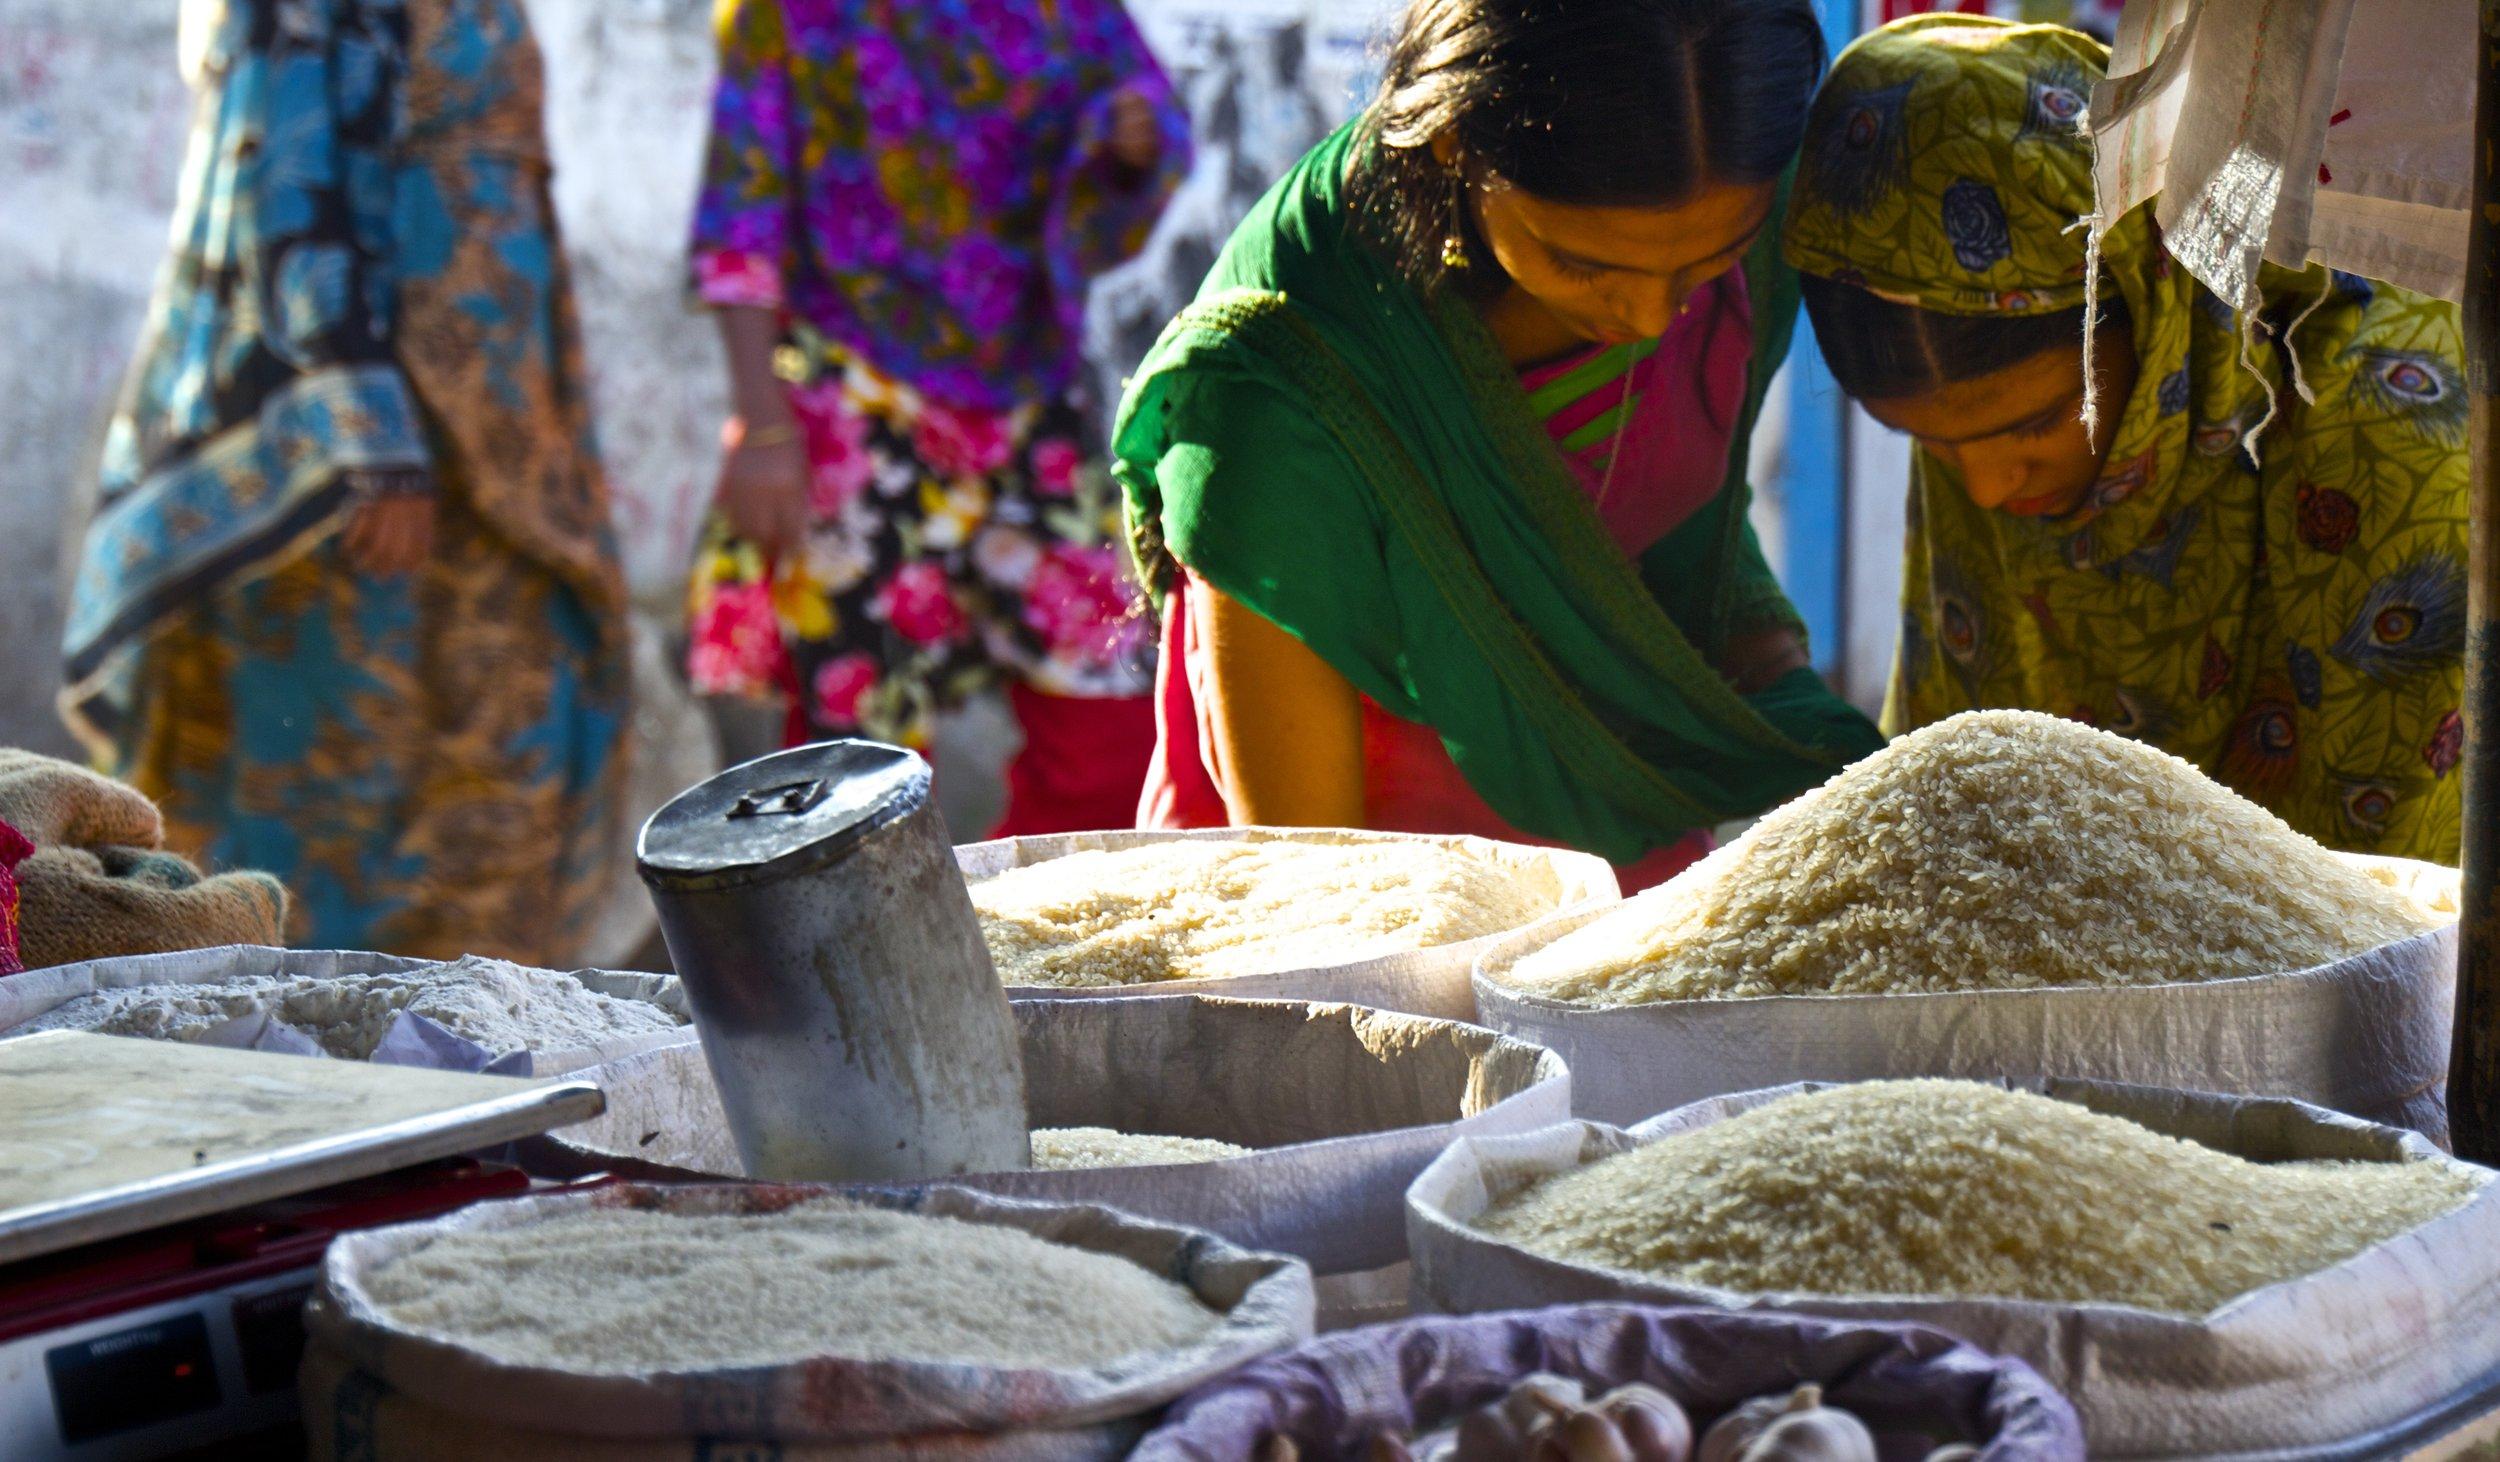 dhaka rayer bazar slum market 4.jpg